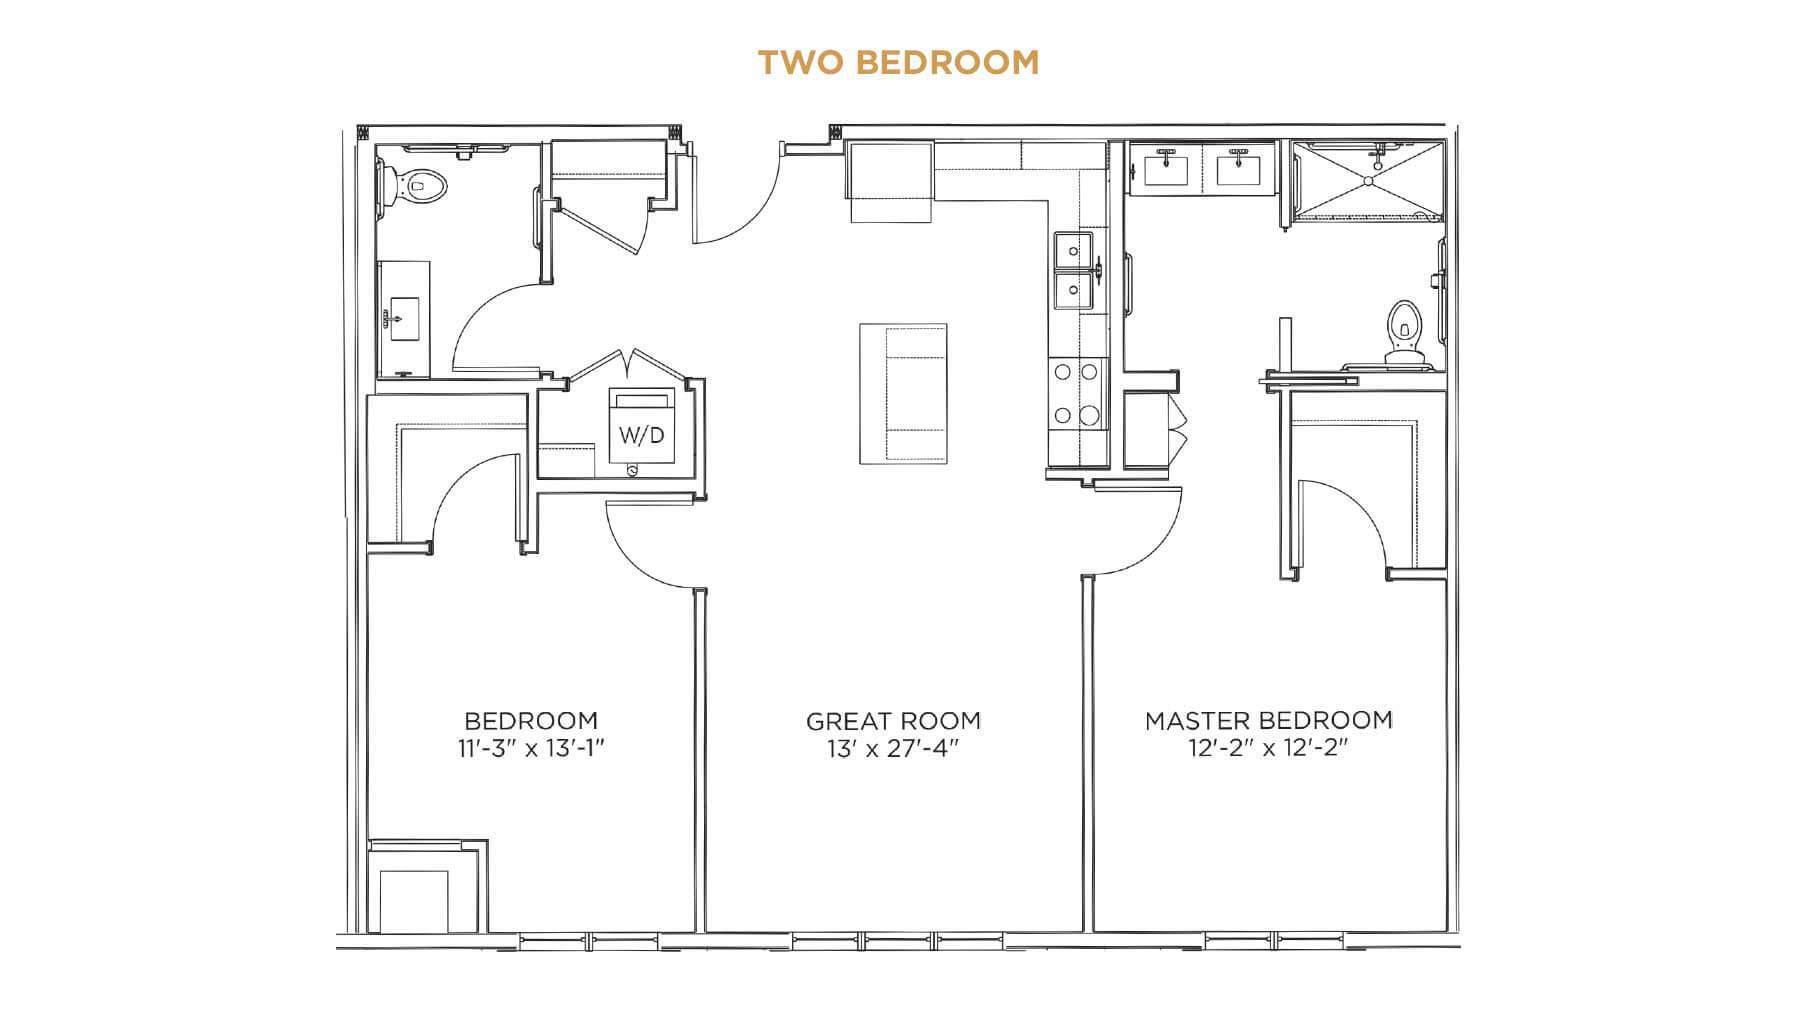 Two Bedroom Floor Plan - senior living 55+ communities Cedar Rapids - Grand Living at Indian Creek